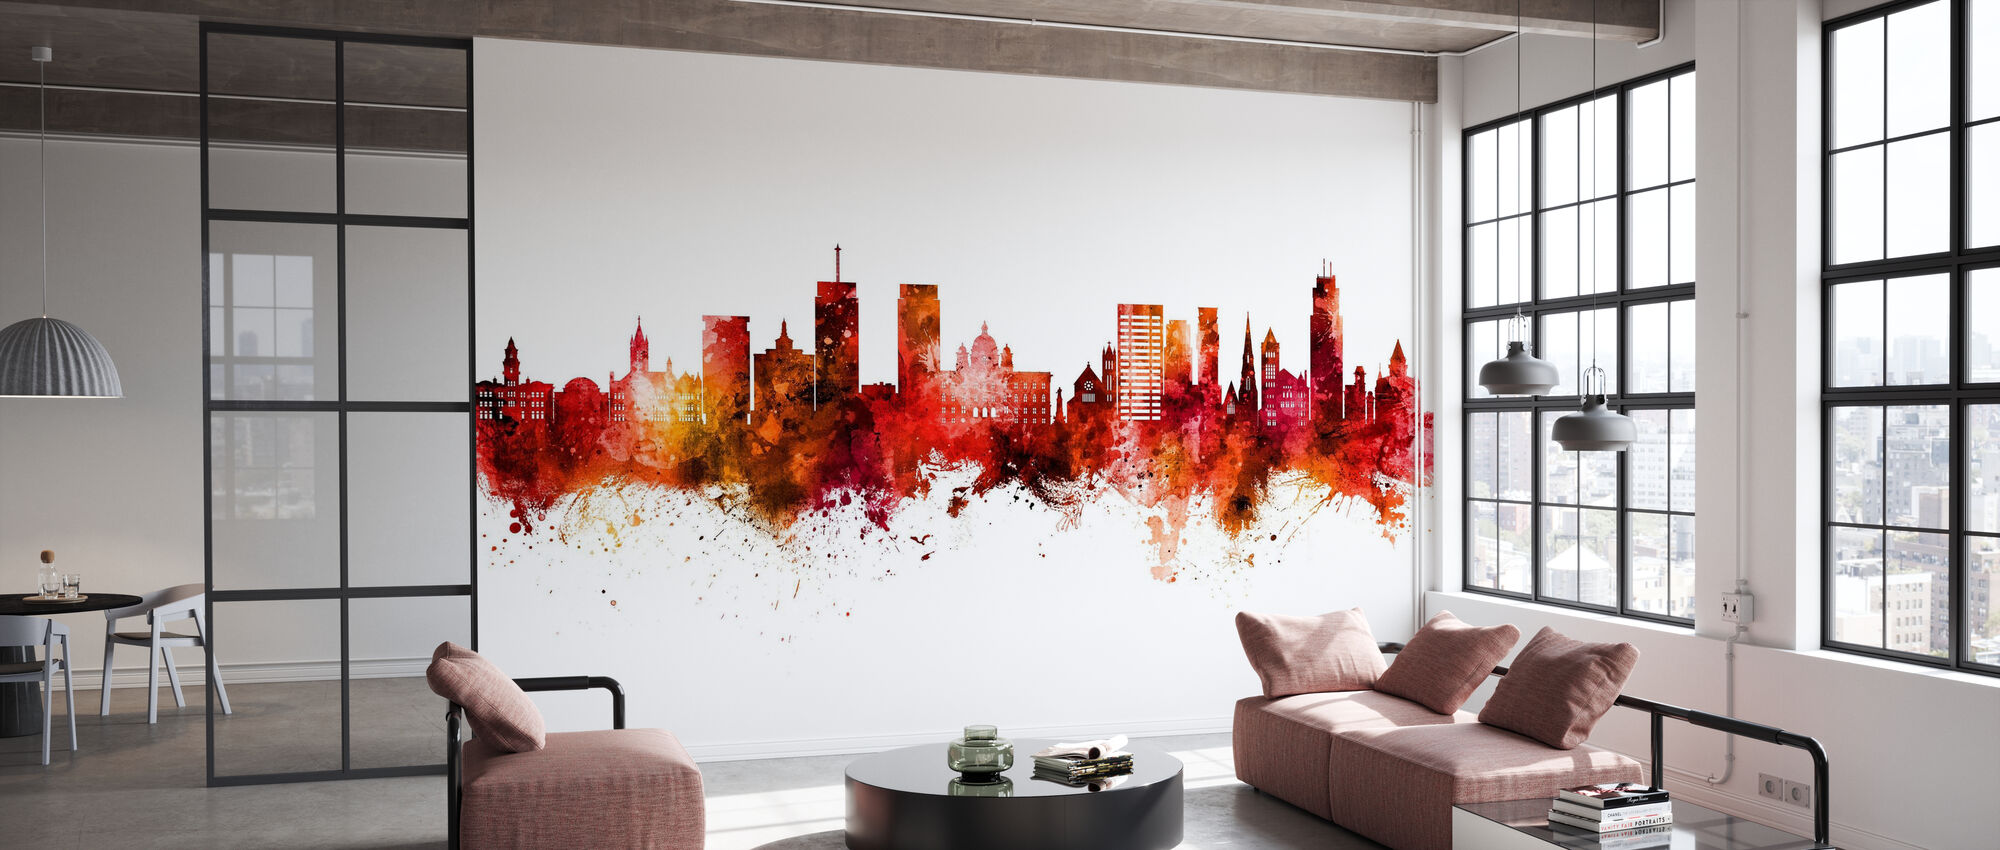 Syracuse New York Skyline - Wallpaper - Office